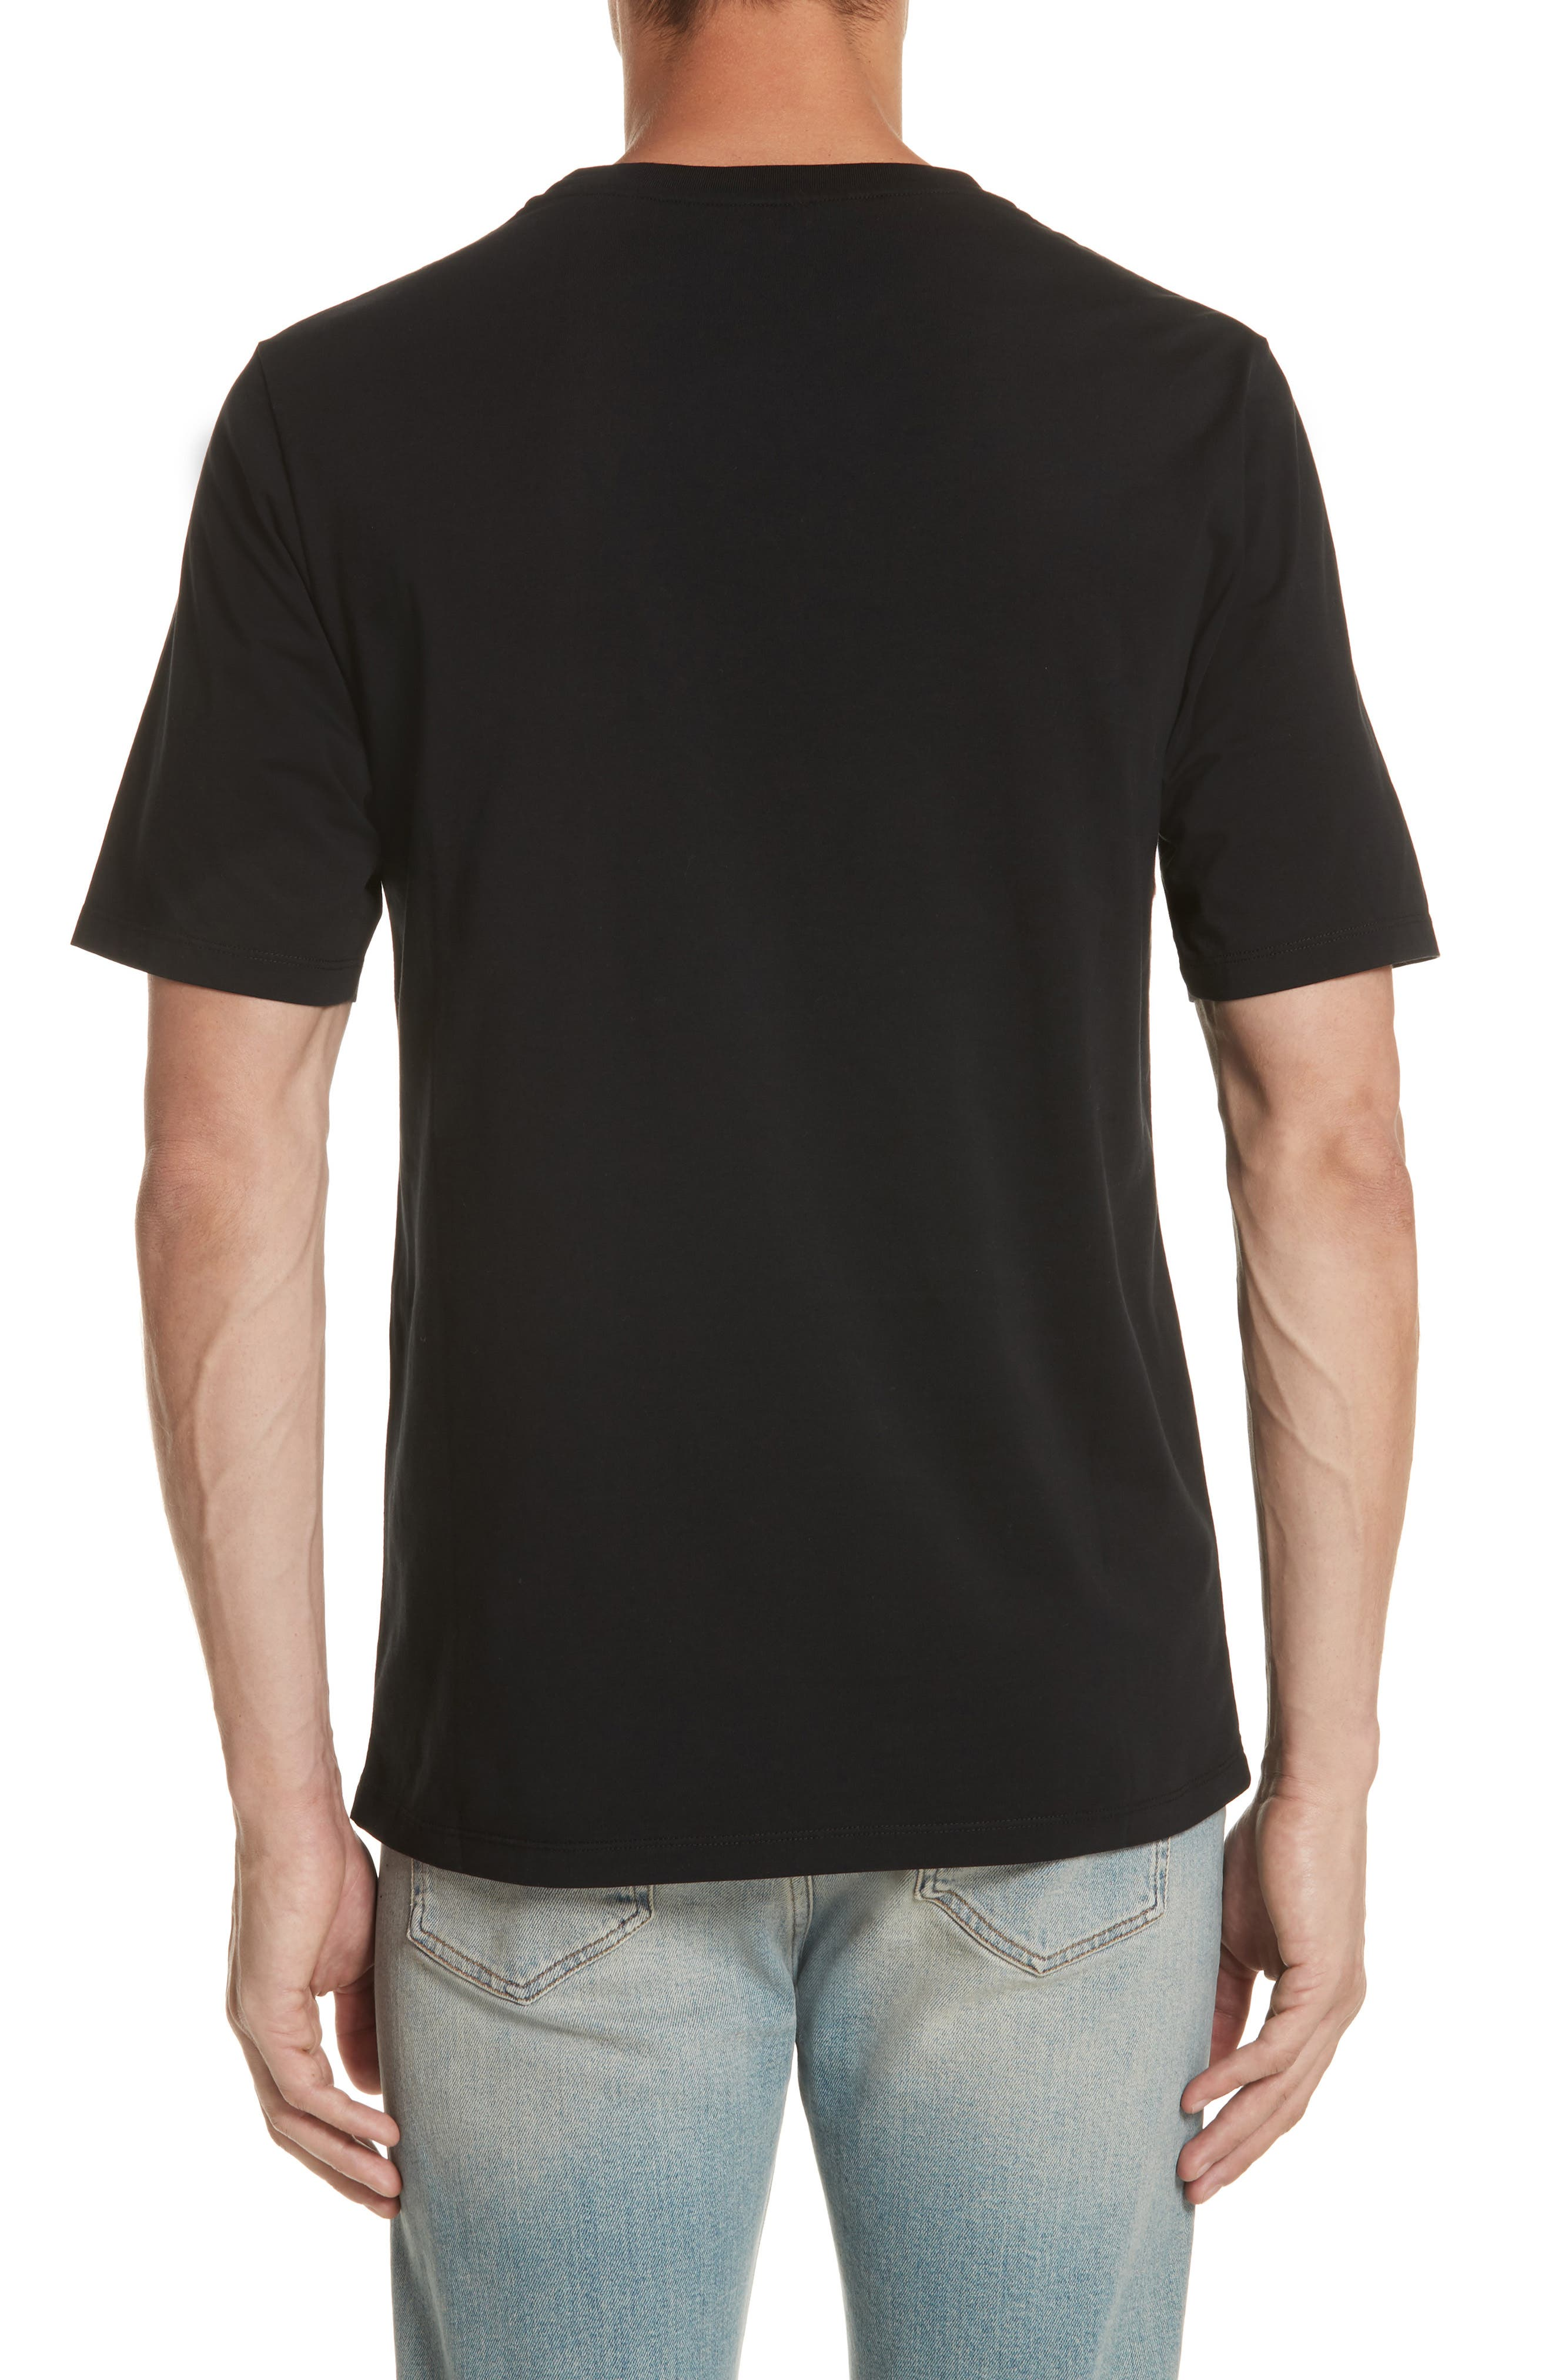 LOEWE, Anagram Logo T-Shirt, Alternate thumbnail 2, color, BLACK